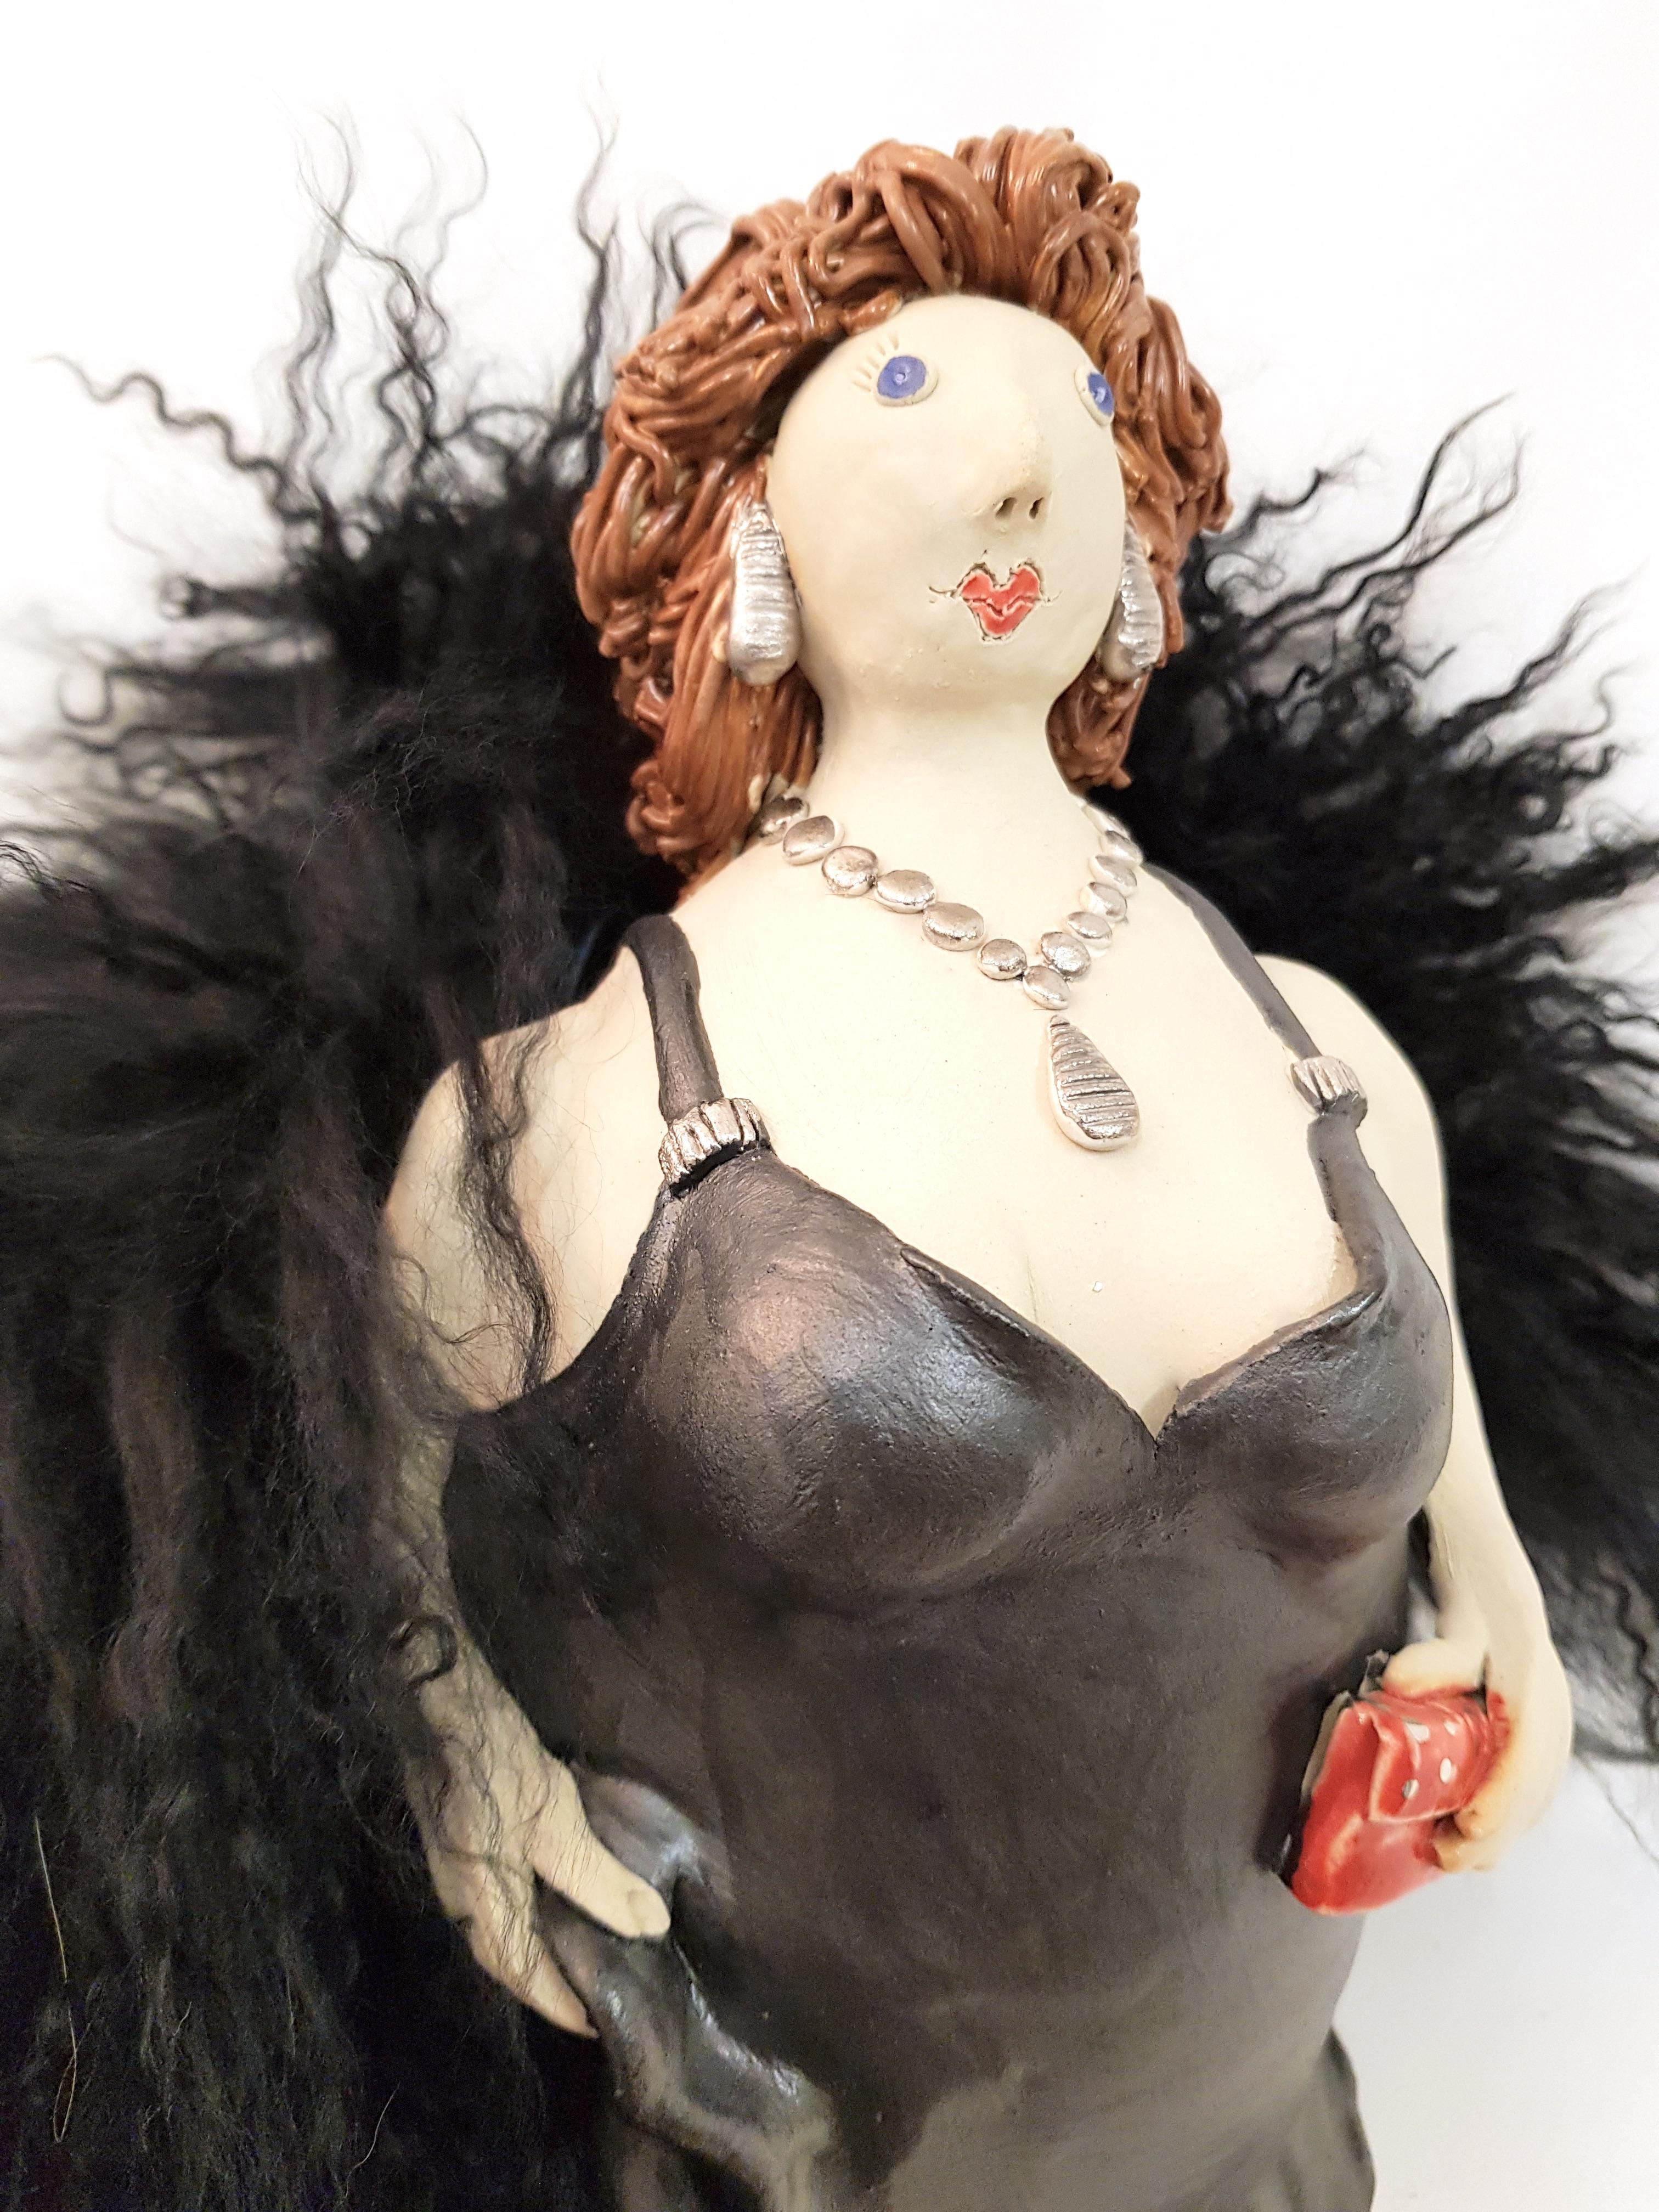 Diva little black dress, Töpferei la Ceramica Basel, Unikat, Keramik, Frauenpower, Töpferkurse, Teamevent